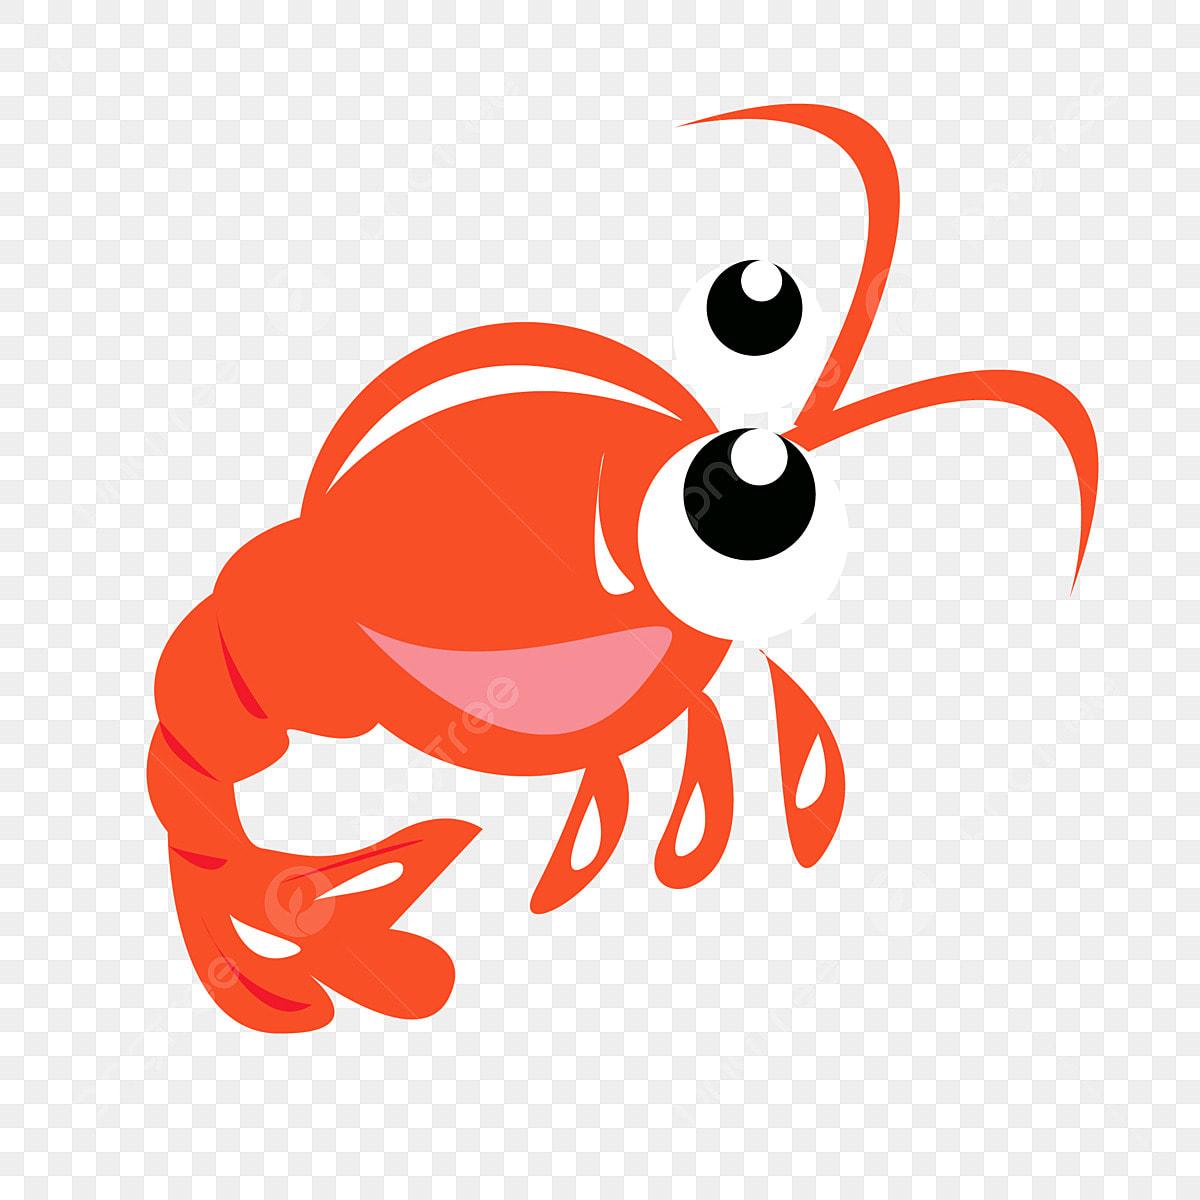 Seafood Live Shrimp Lobster Lobster Crayfish Seafood Live Shrimp Png And Vector With Transparent Background For Free Download